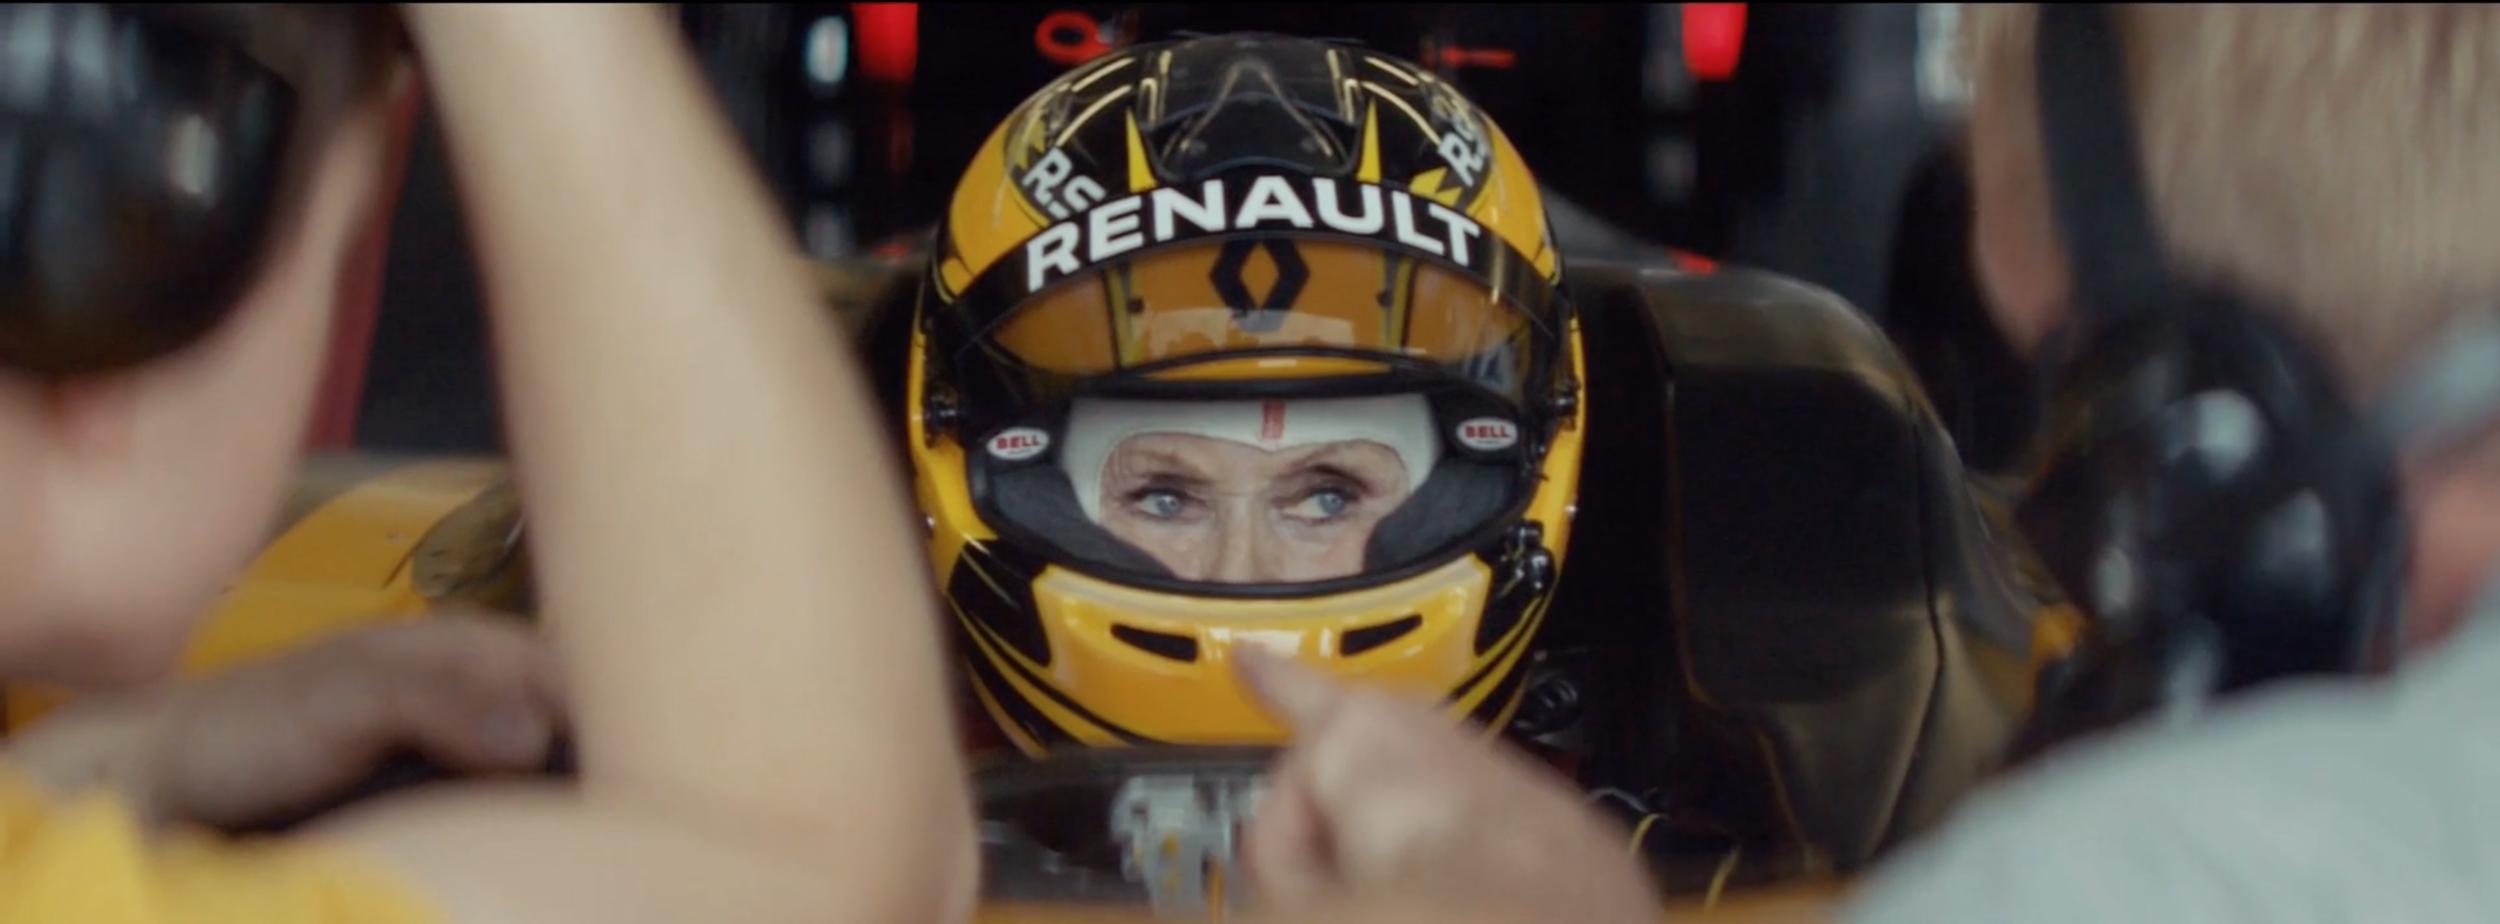 Renault / Director Michel + Nico - Creative Researcher Jody Elizabeth Nolan